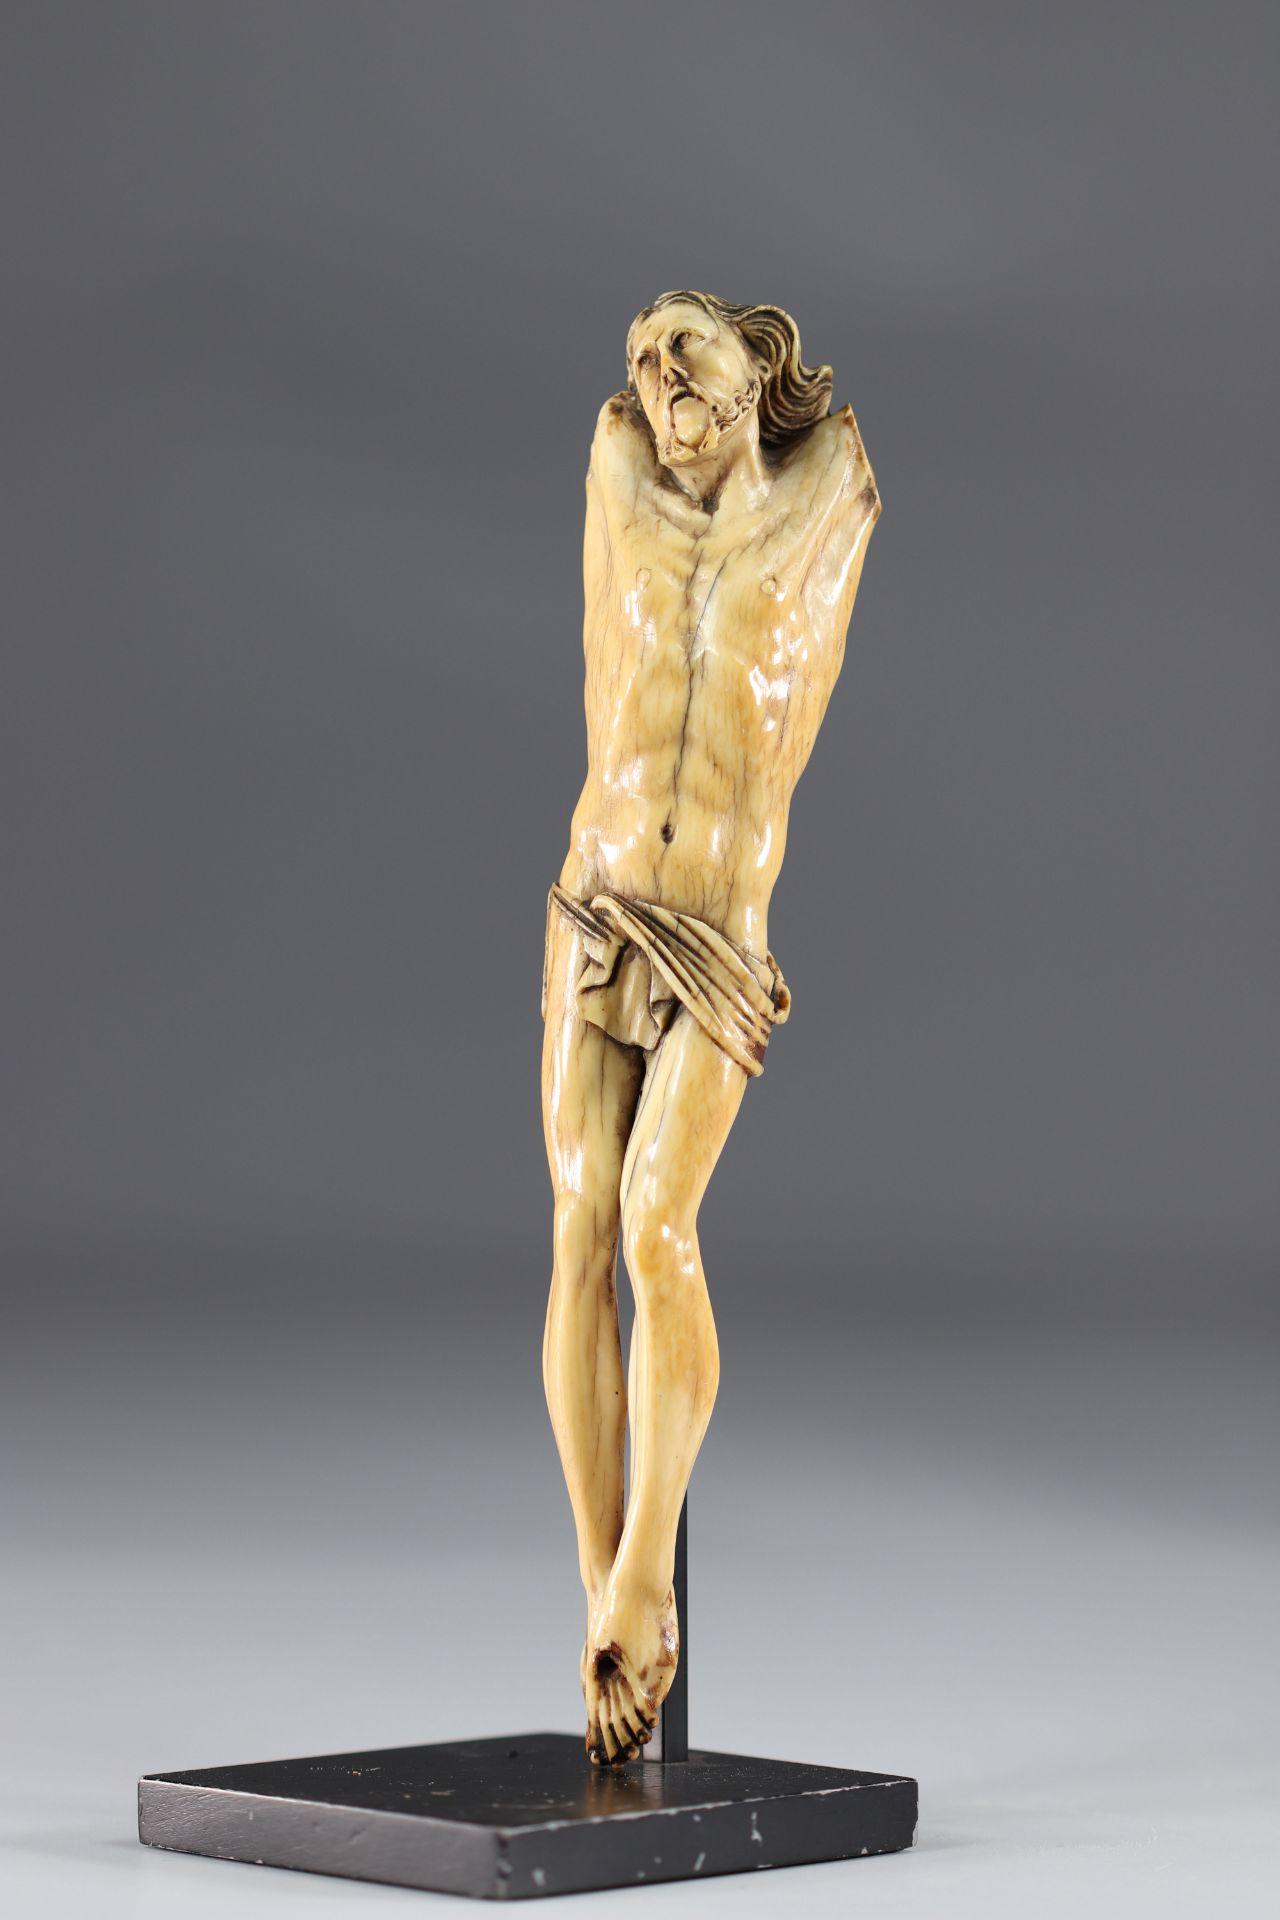 Corpus Christi - Ivory - arm missing - Image 2 of 3